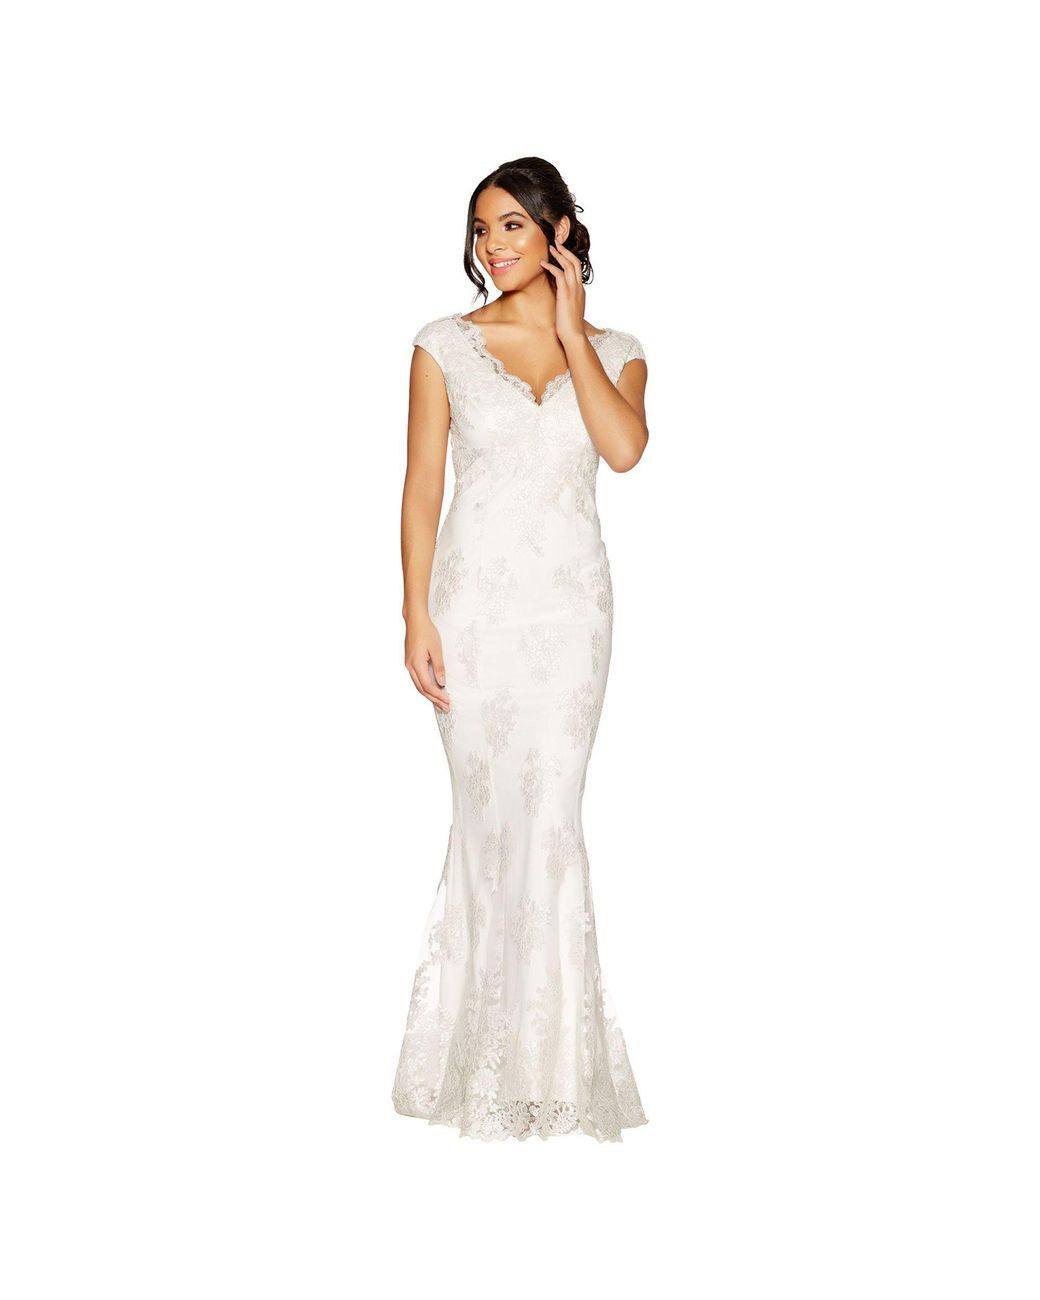 Wedding Dress Quiz.Quiz Clothing Bridal Dress Raveitsafe